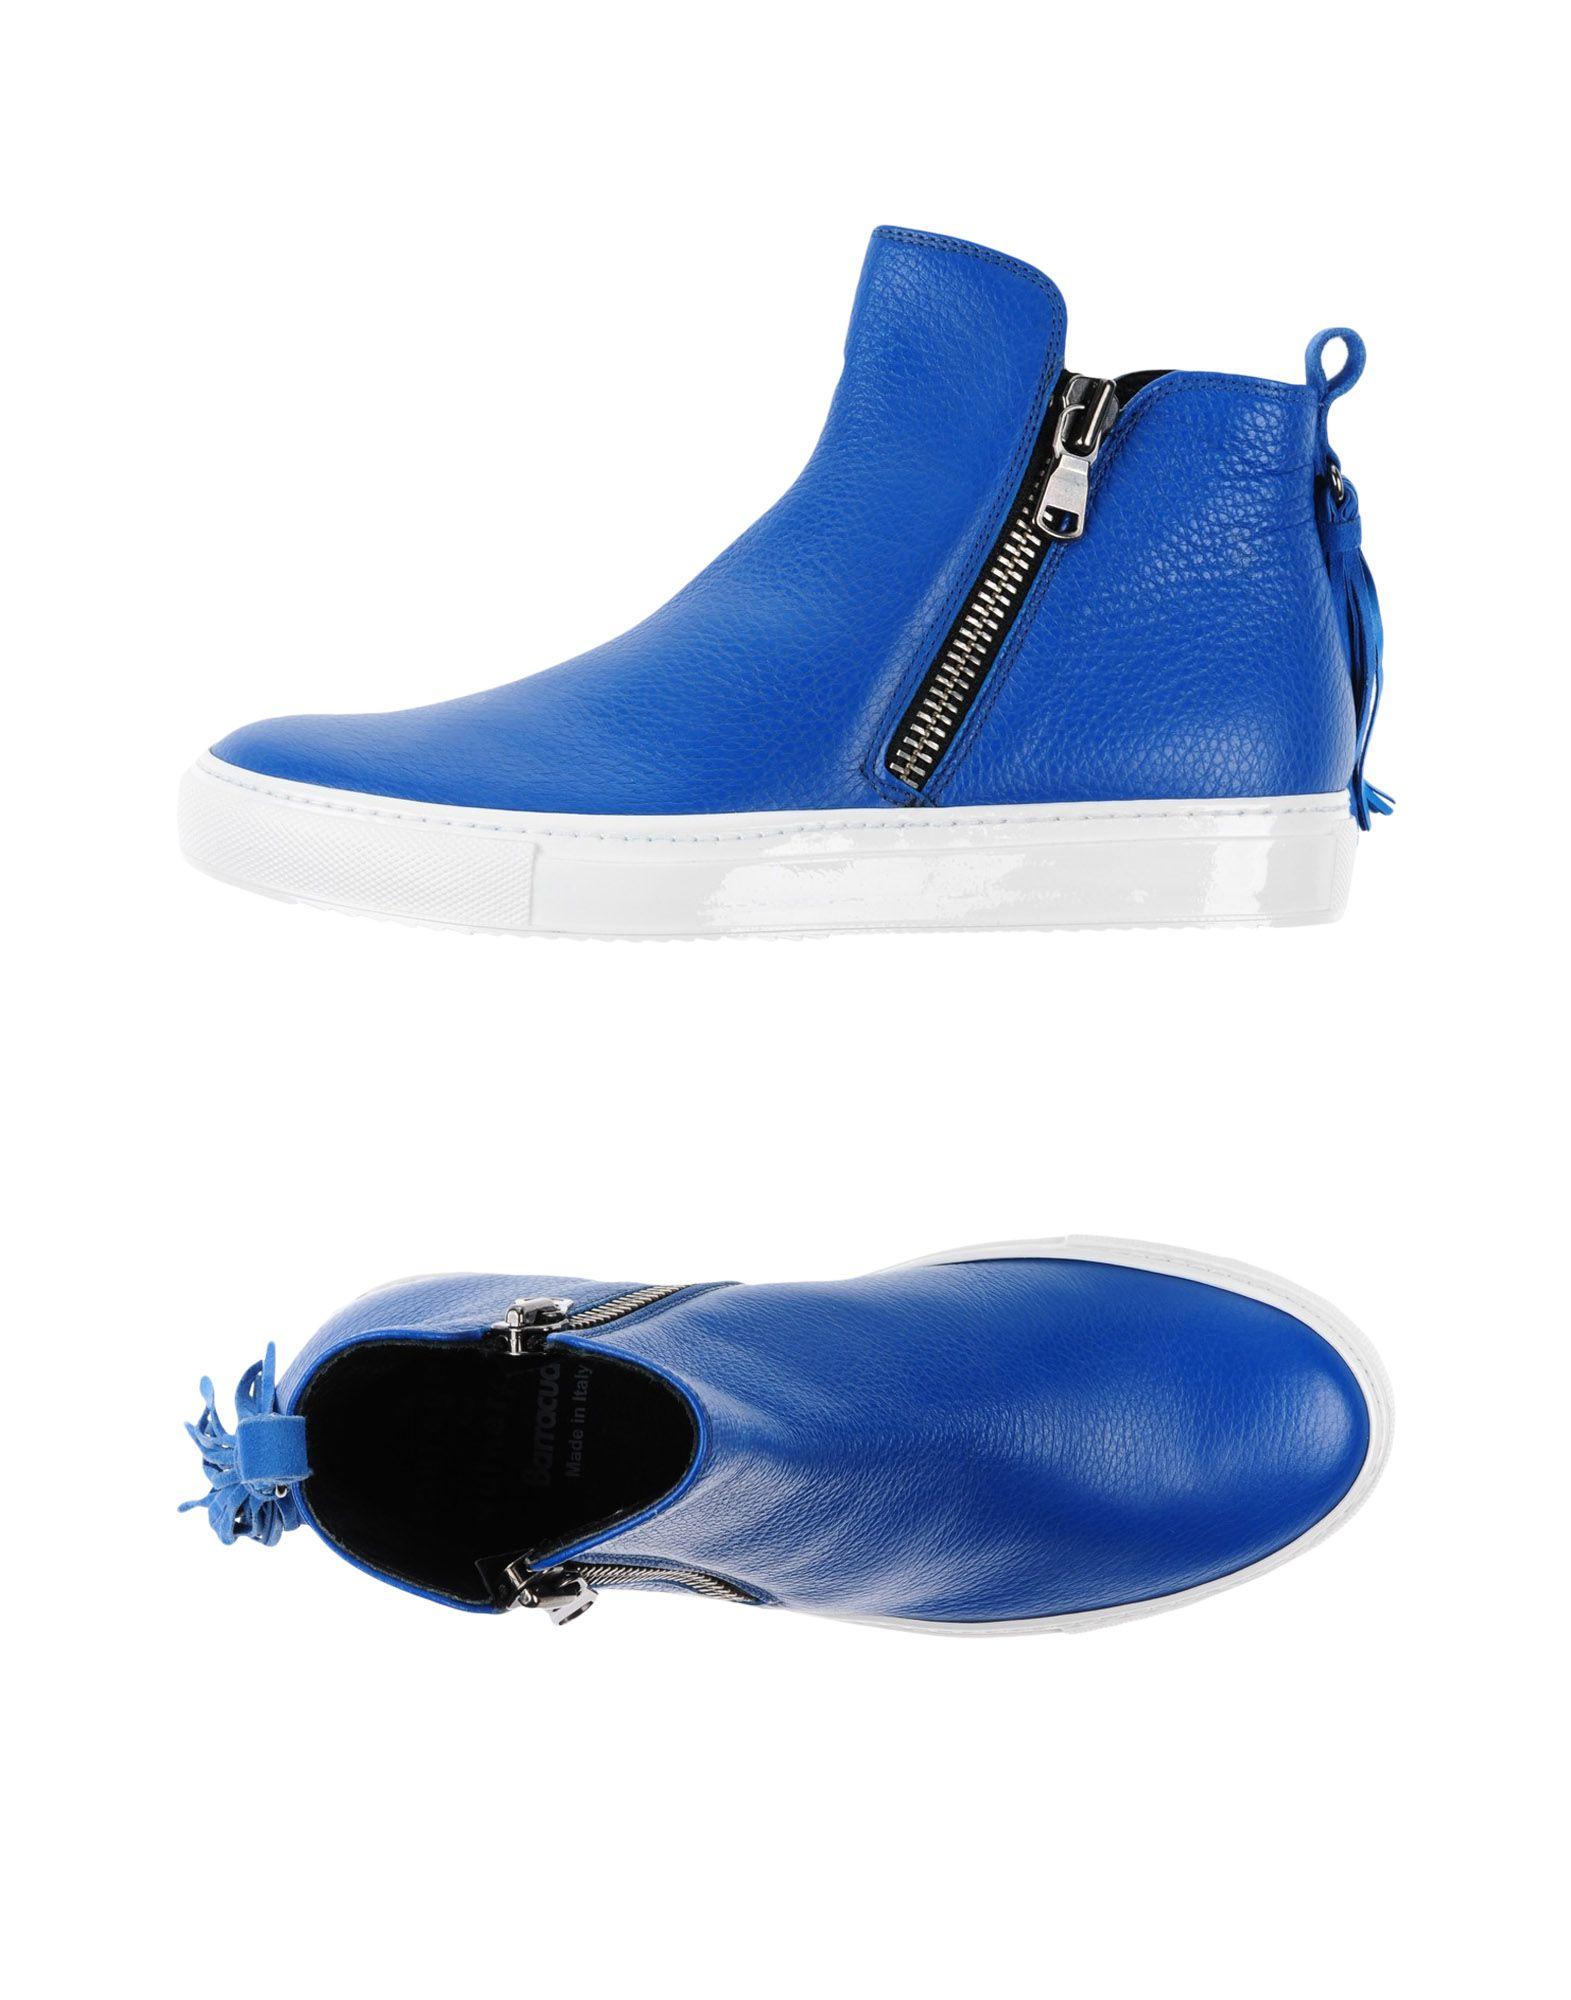 BARRACUDA Высокие кеды и кроссовки кеды кроссовки высокие dc council mid tx stone camo